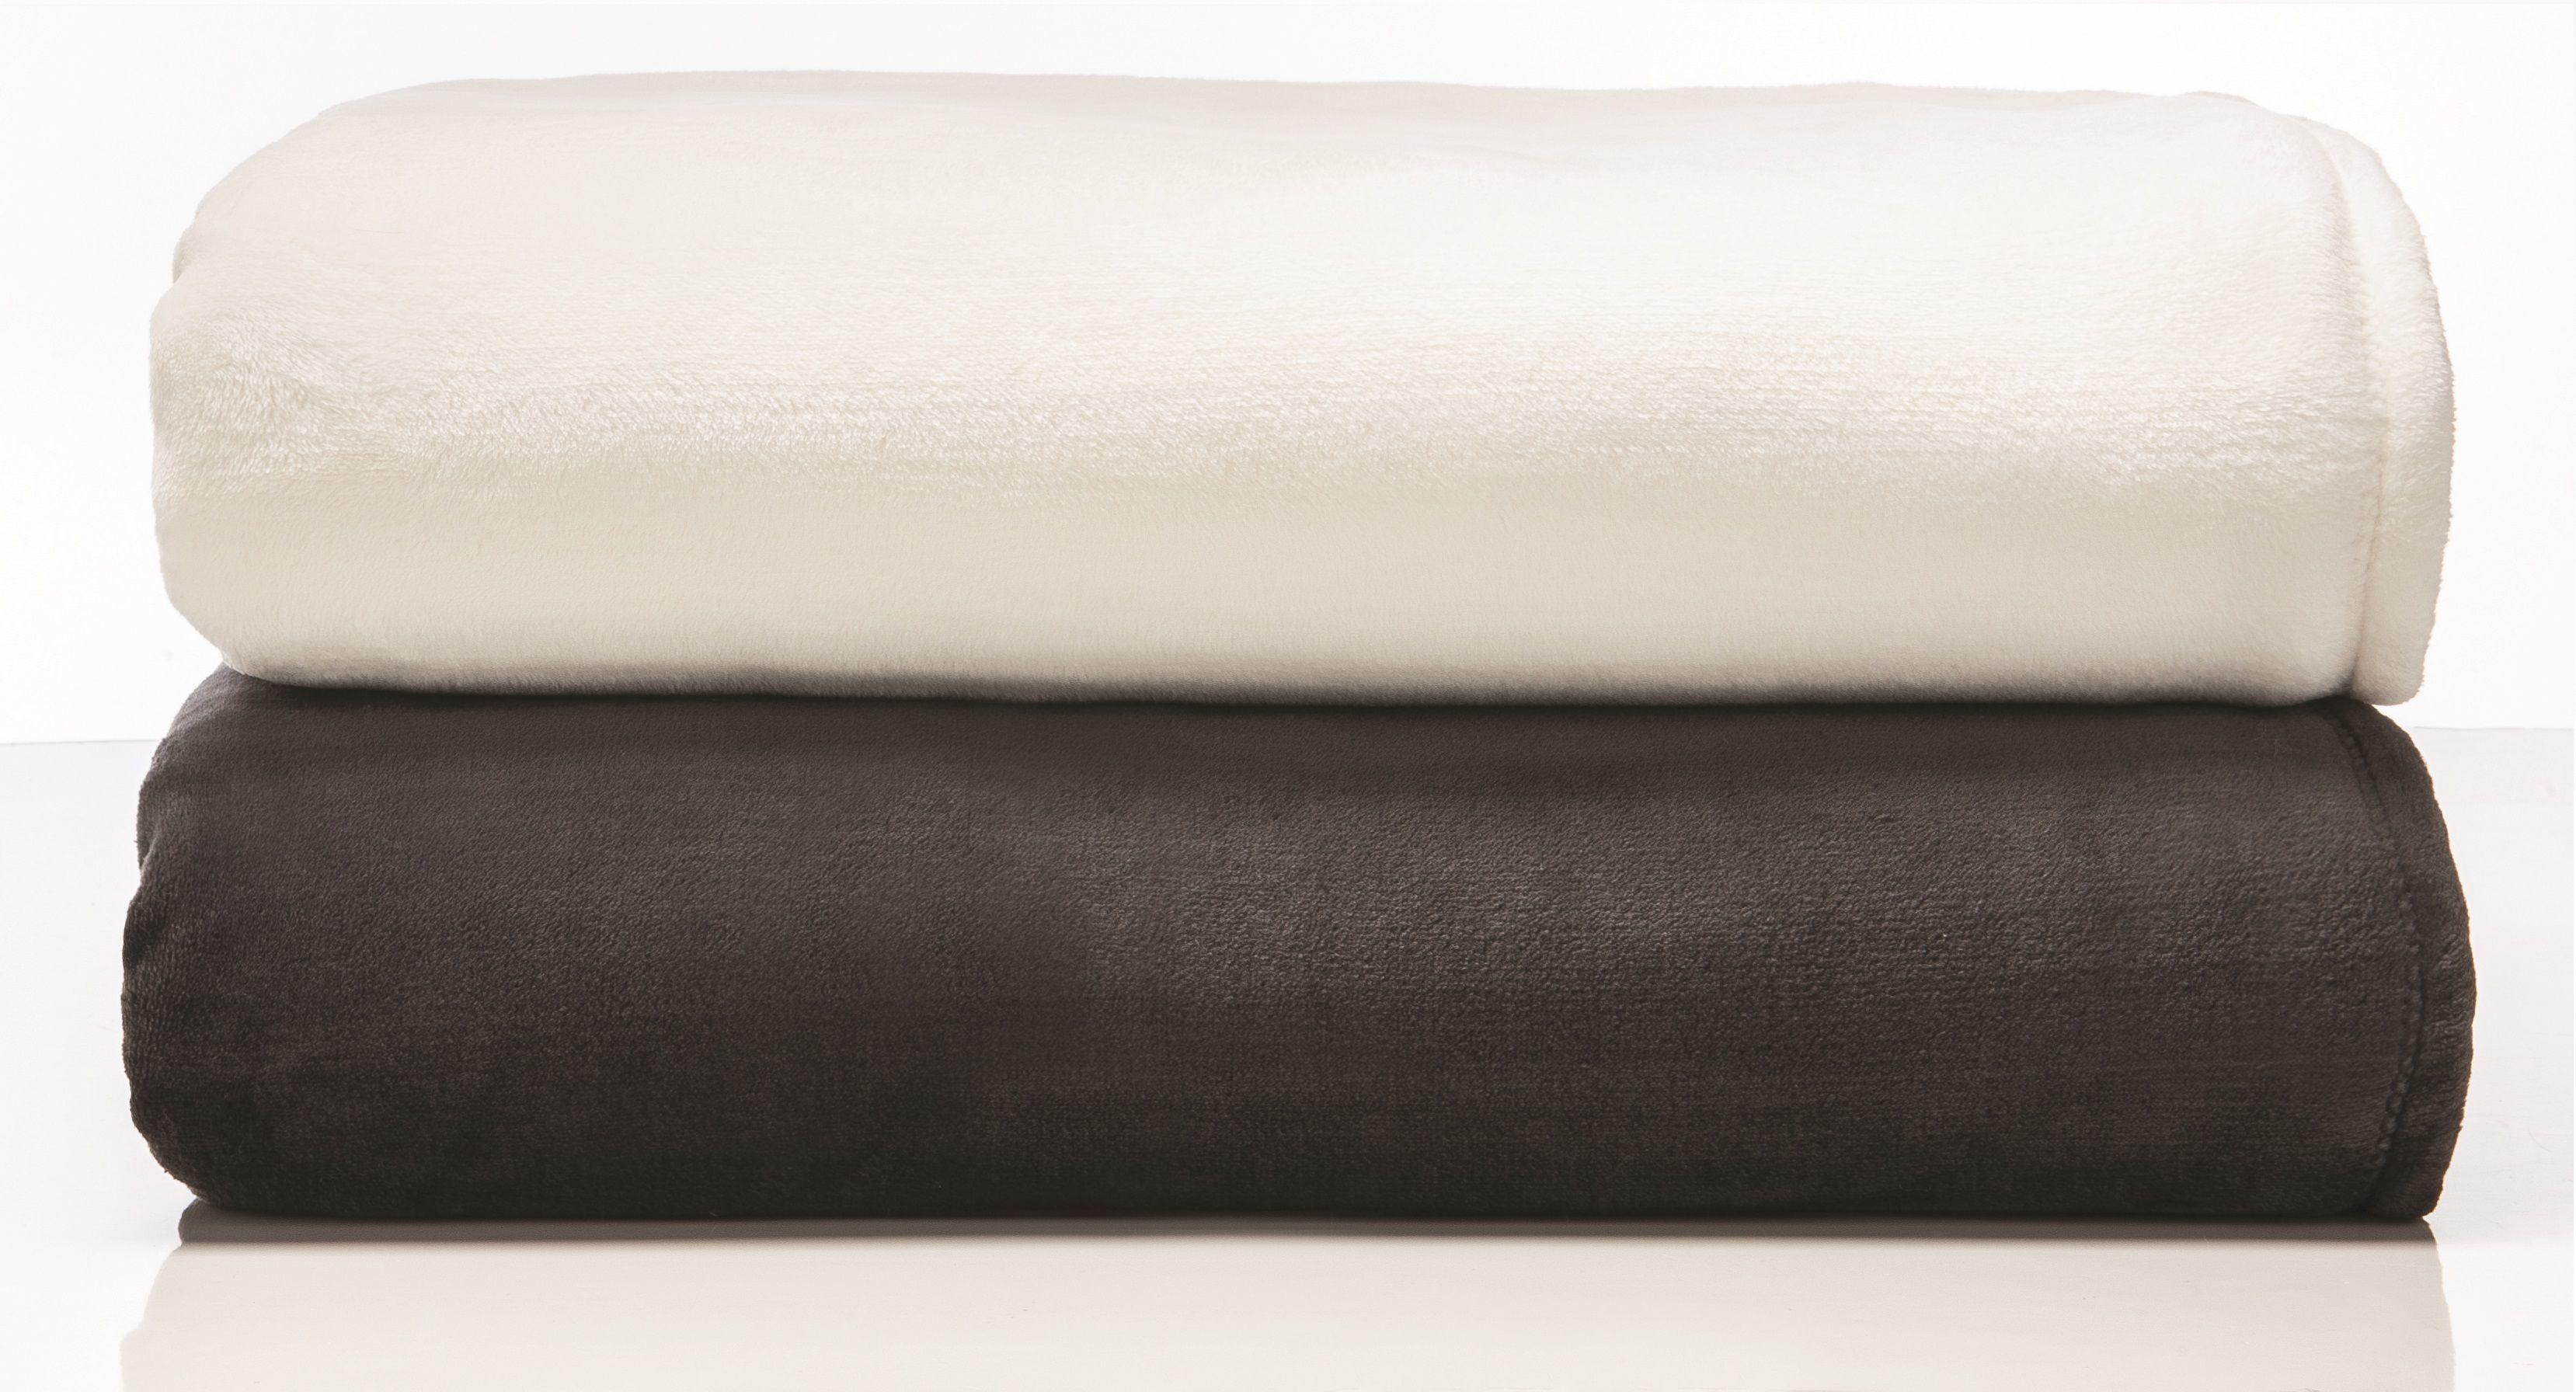 Couverture SOYEUSE en polyester